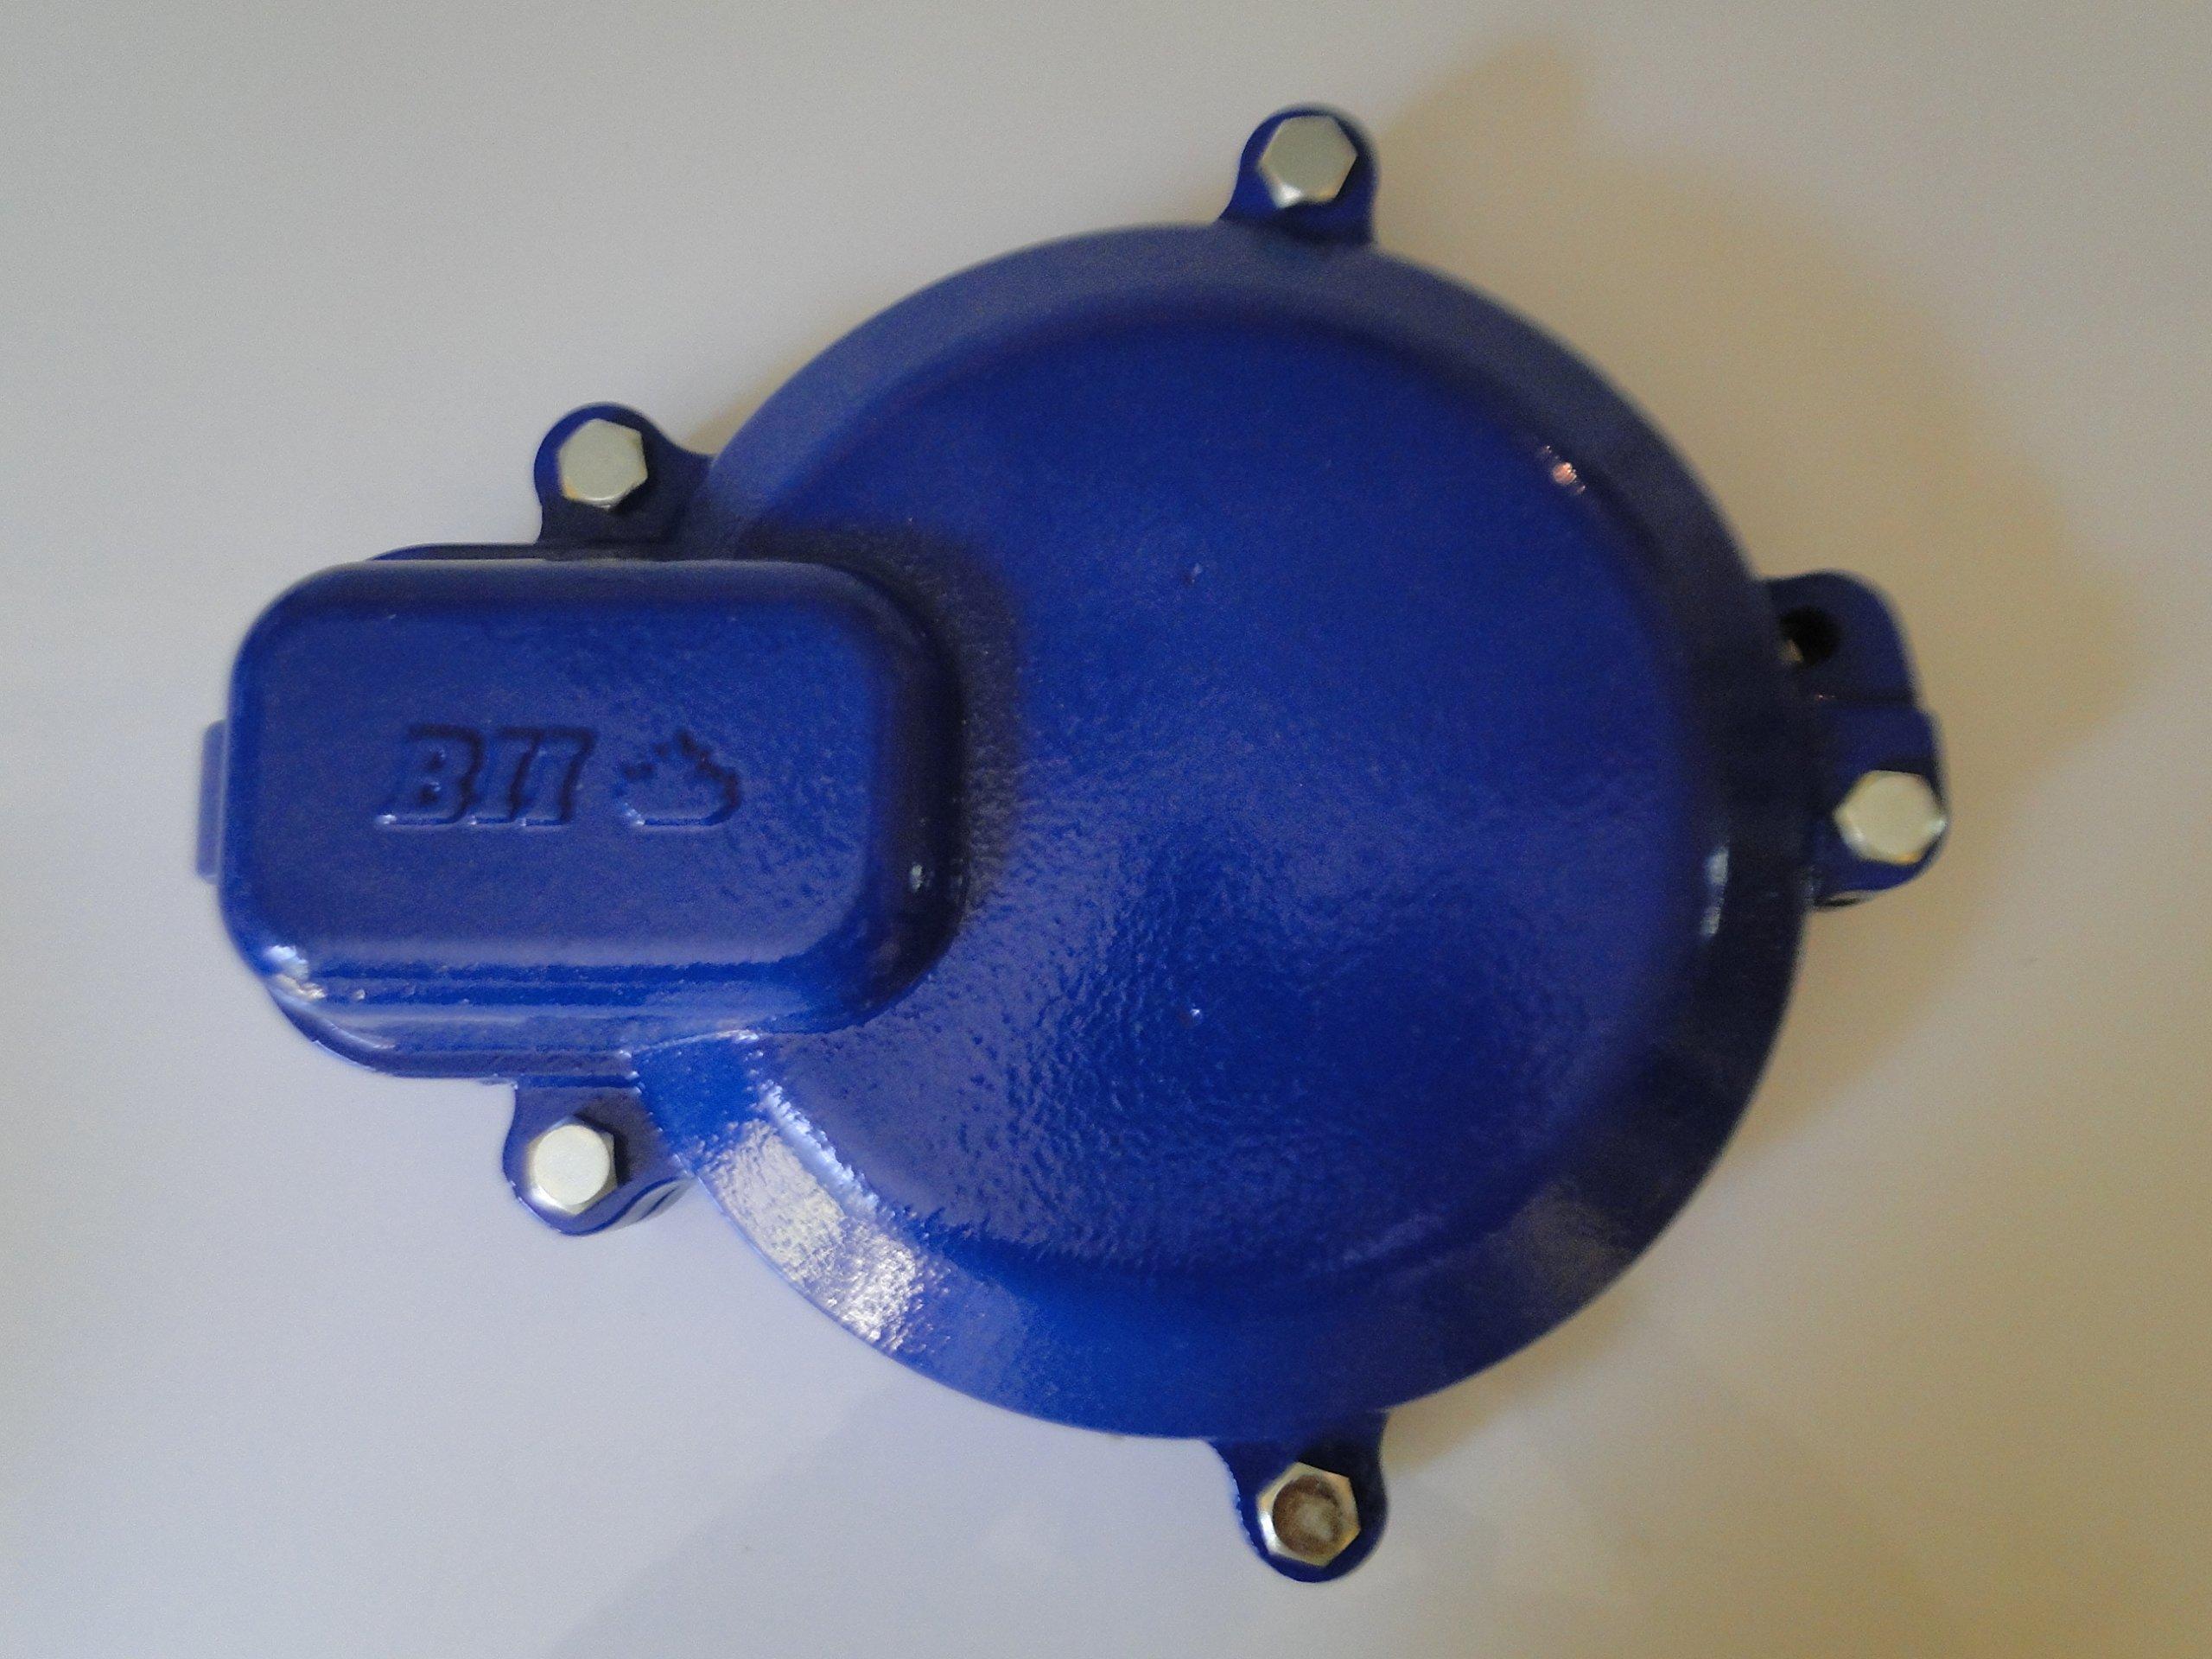 WELL CAP 6'' Watertight CAST IRON Heavy Duty Locking Well Cap by BOSHART INDUSTRIES